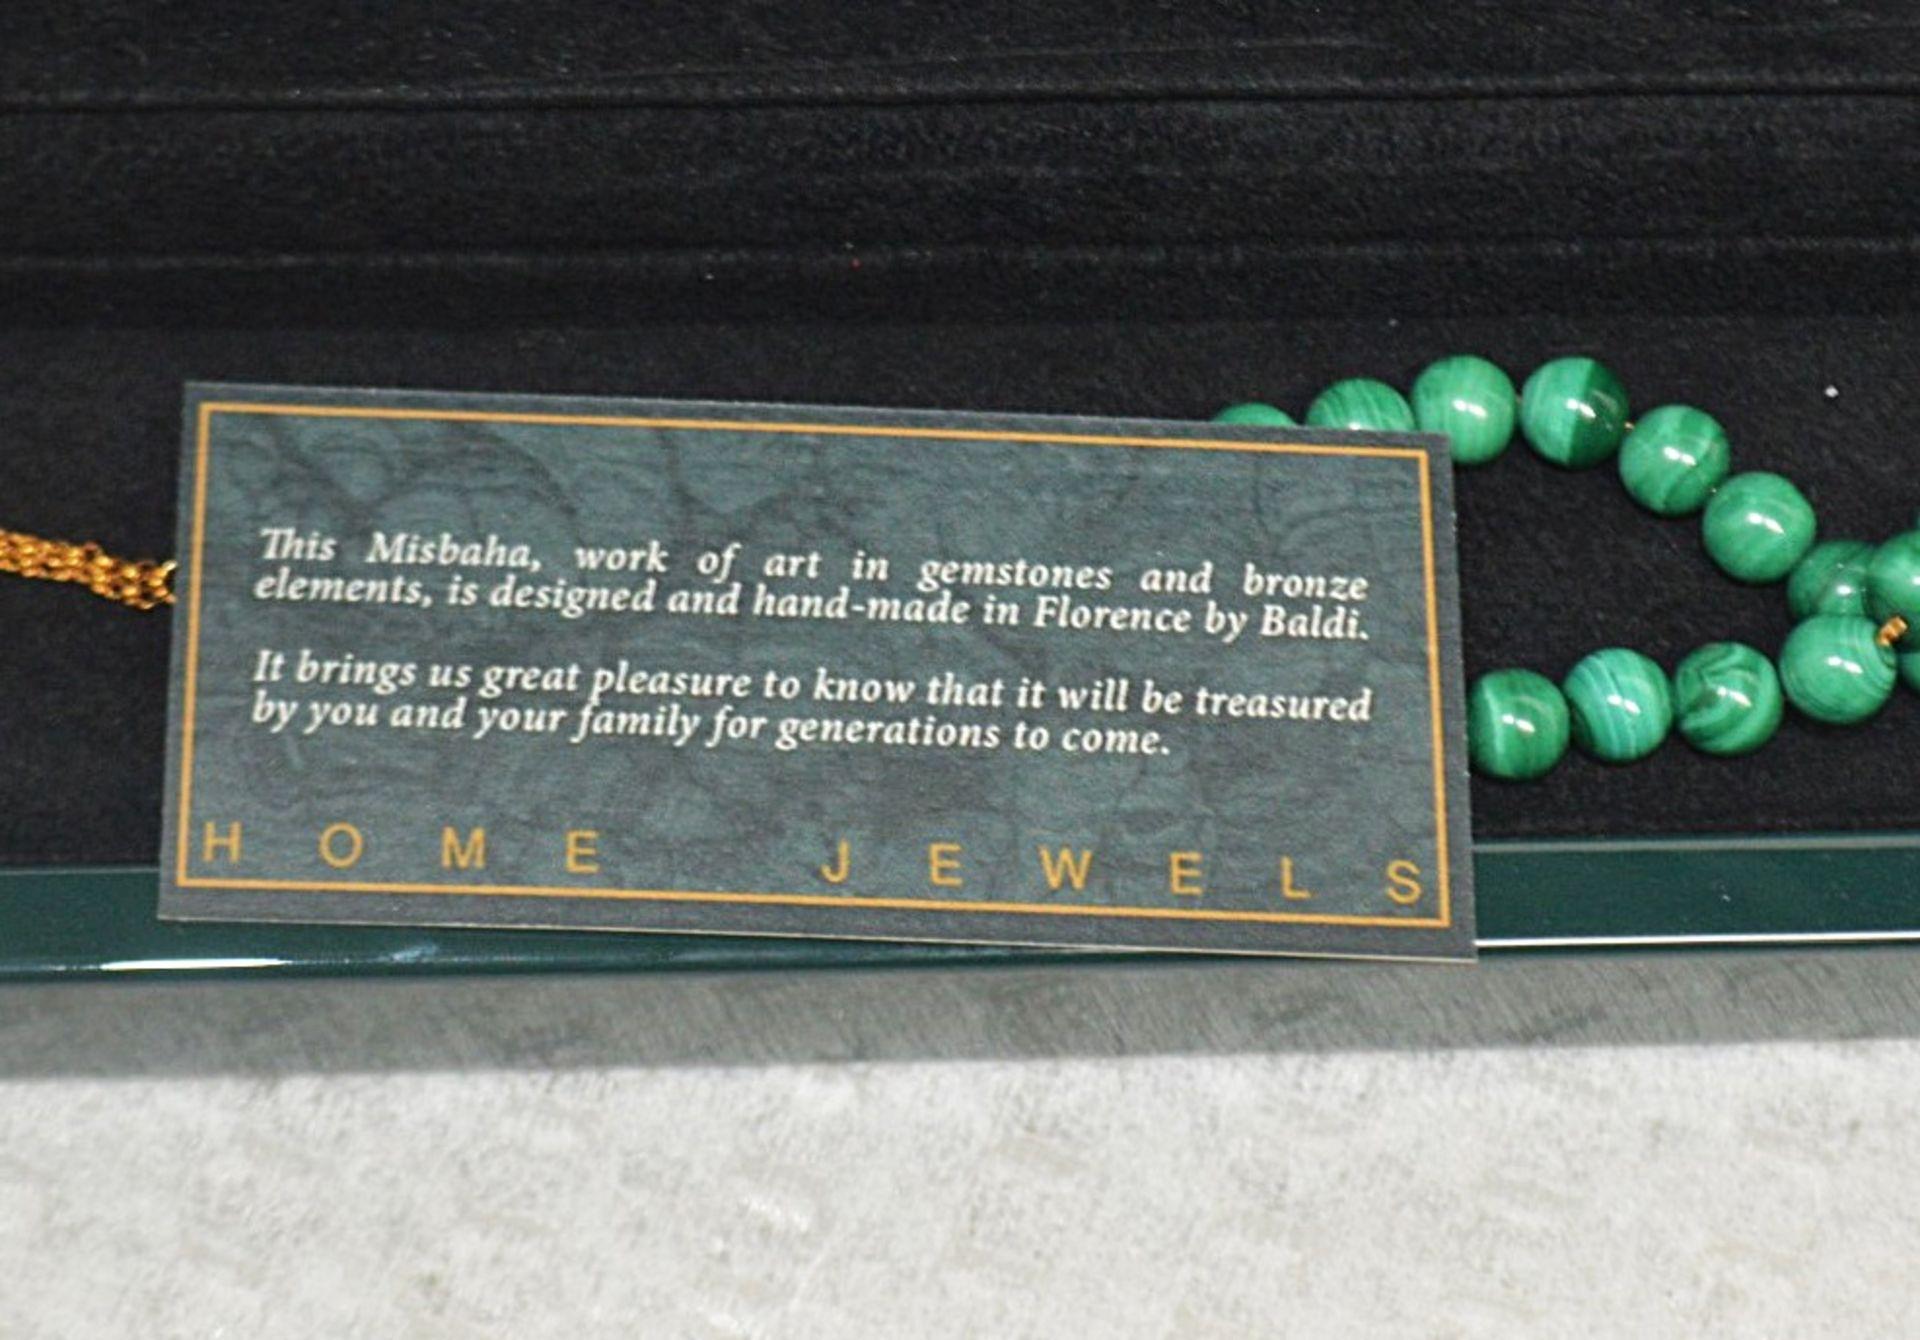 1 x BALDI 'Home Jewels' Italian Hand-crafted Artisan MISBAHA Prayer Beads In Green Malachite And - Image 4 of 5